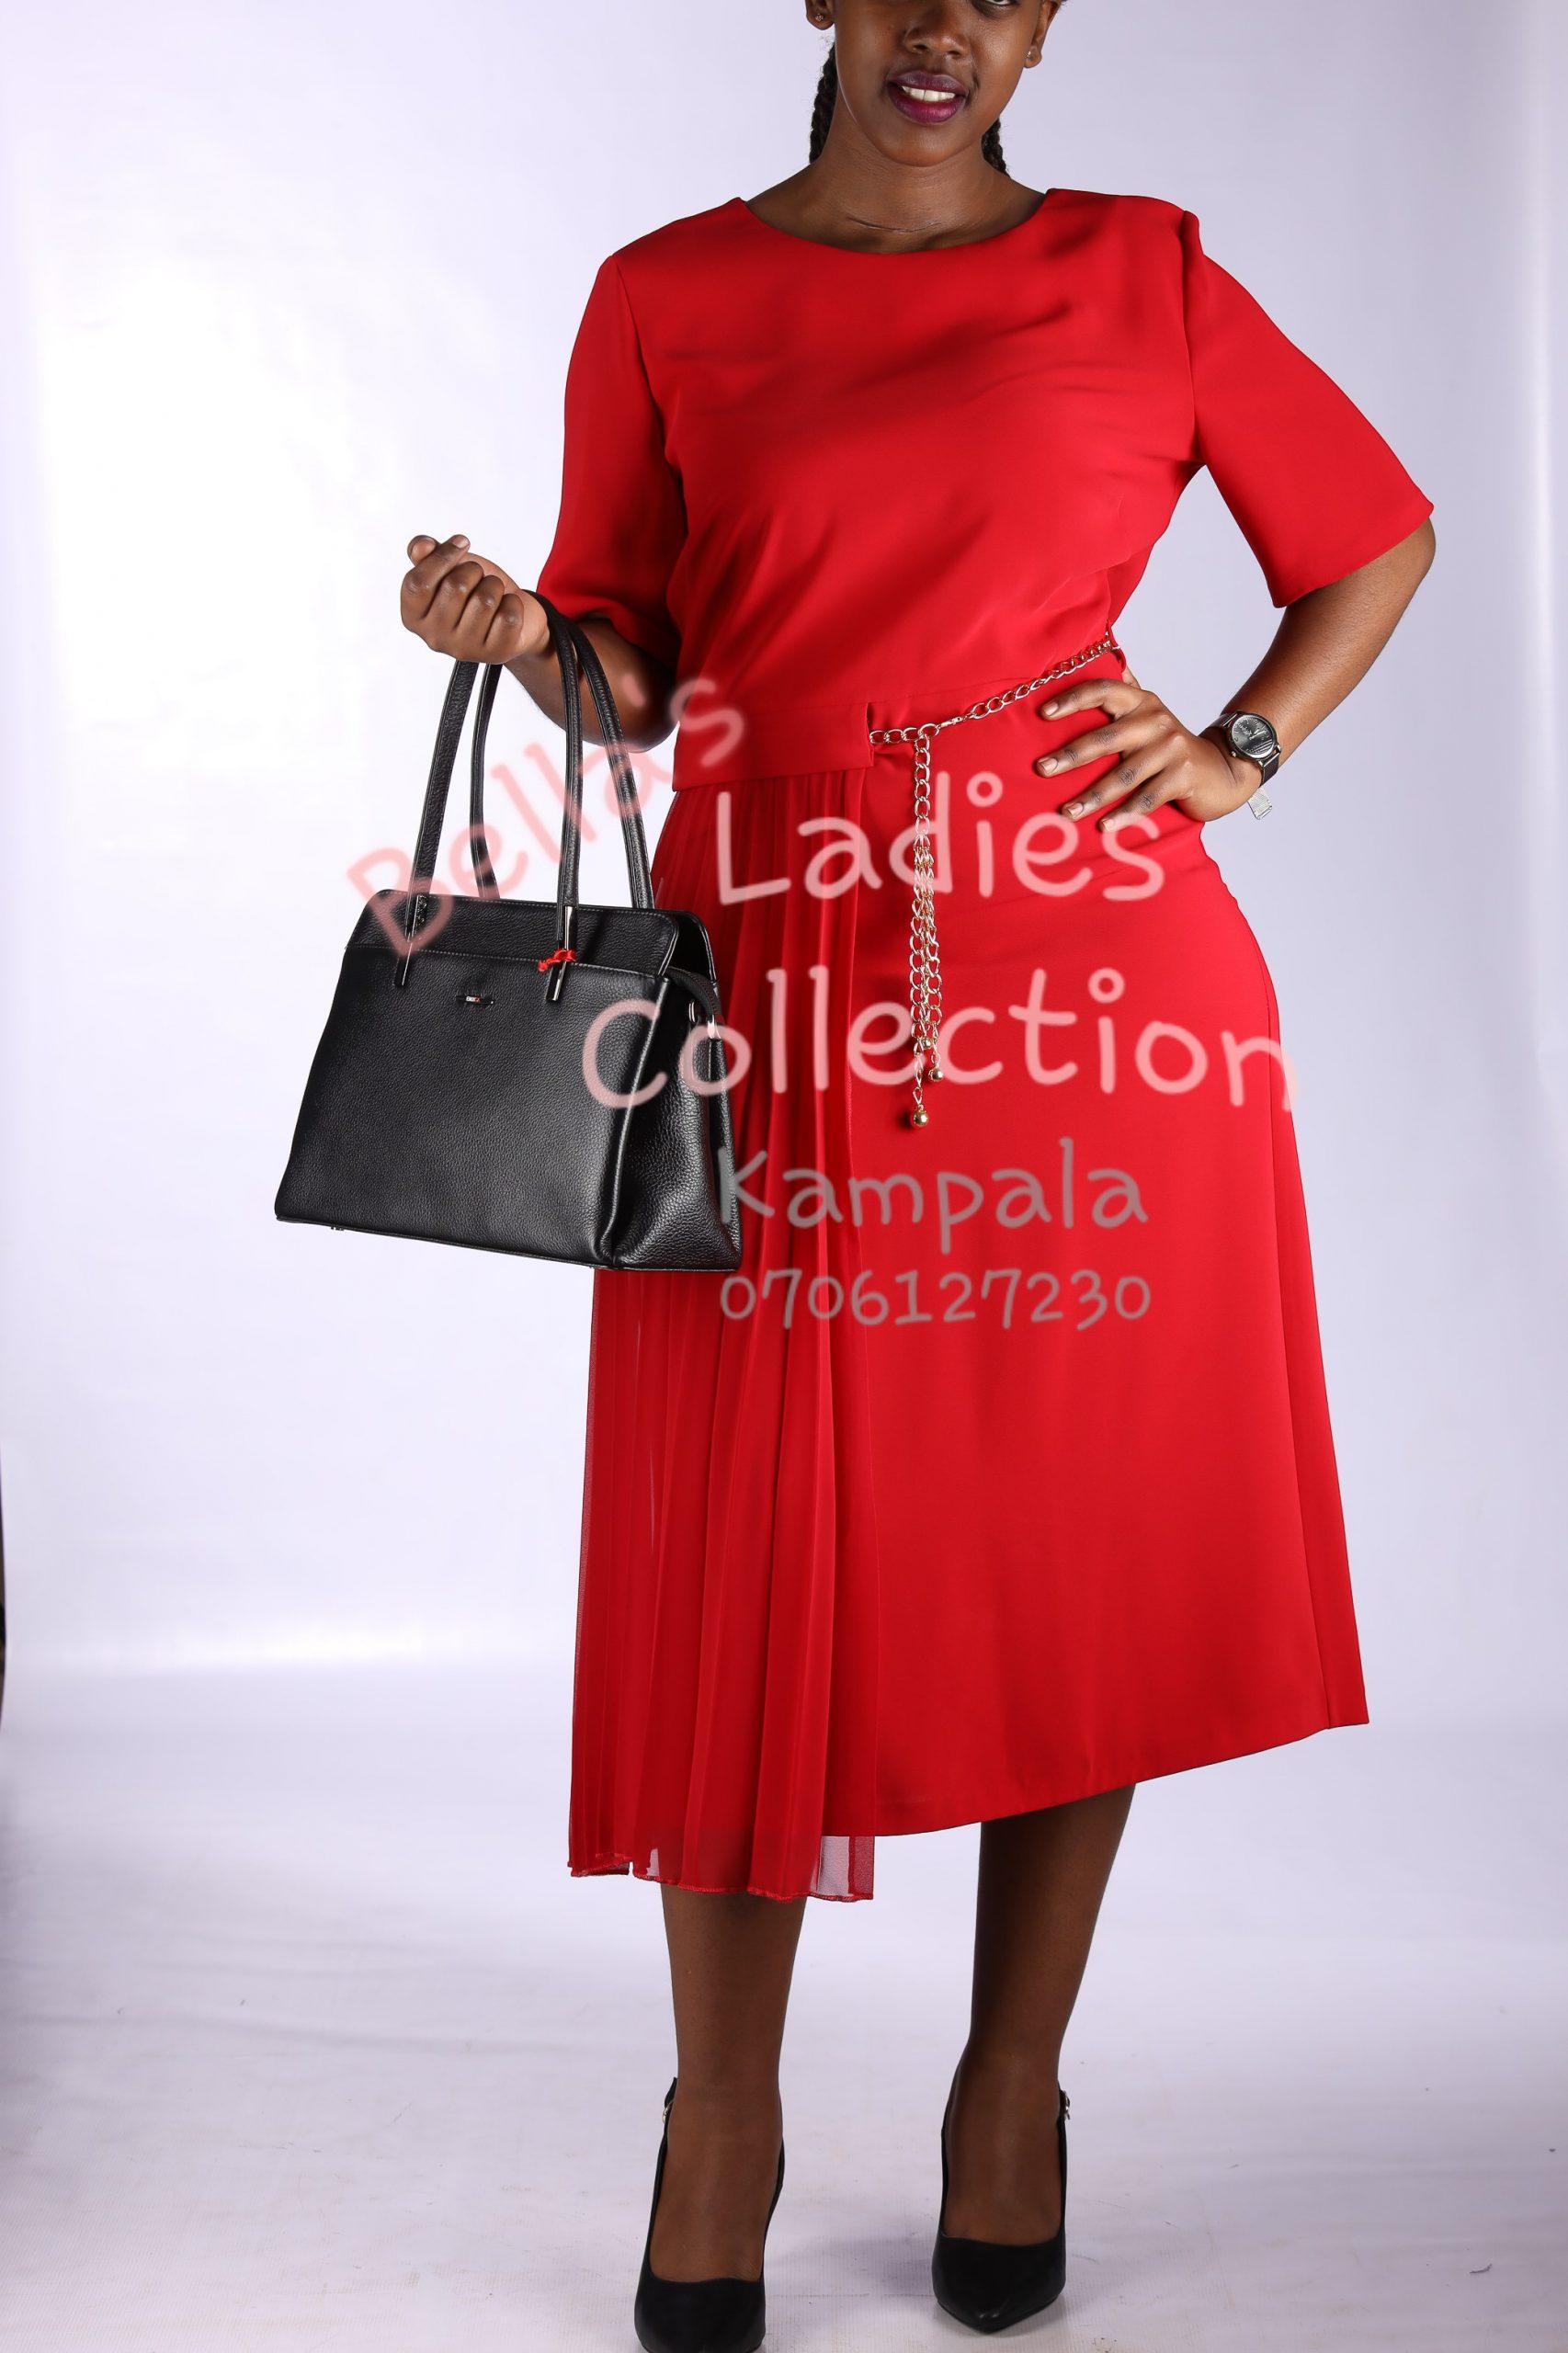 Ladies Dress in Kampala